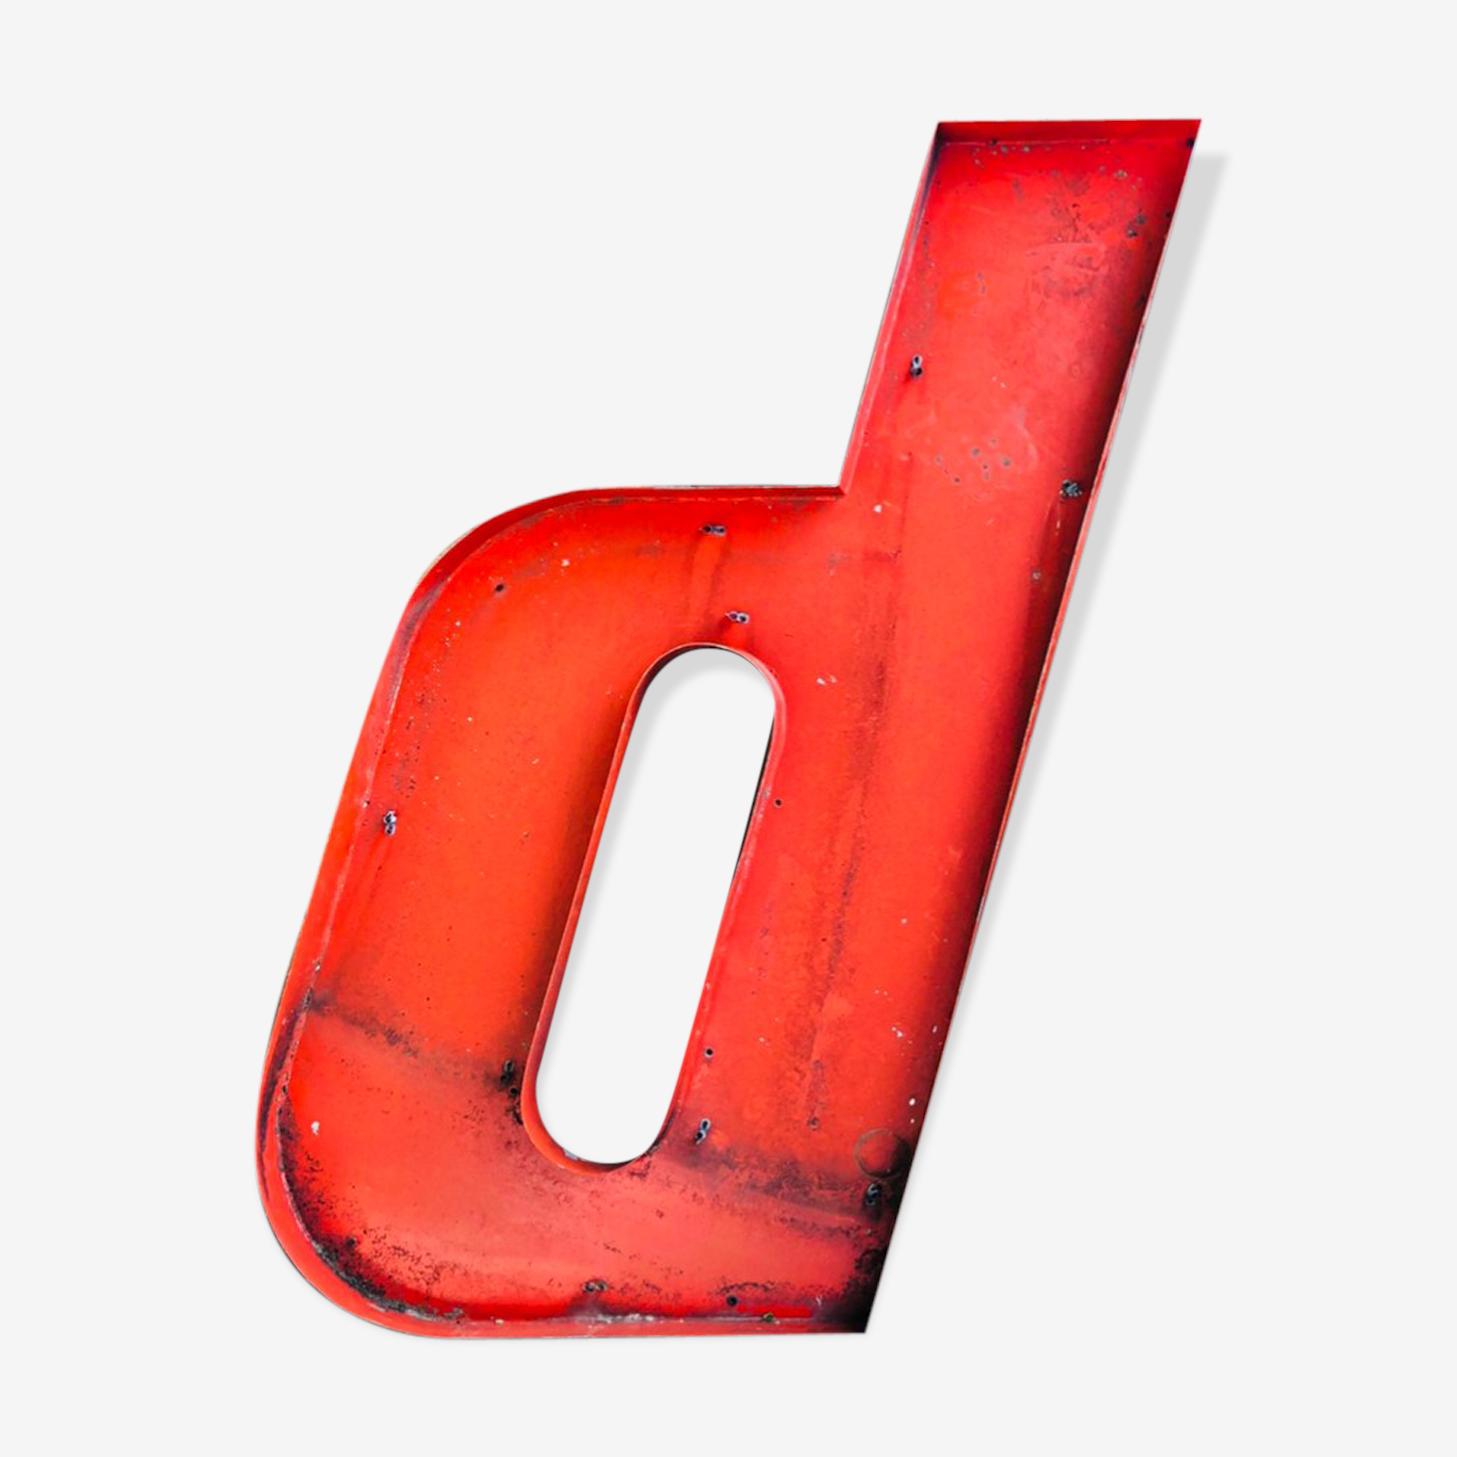 Letter D in metal